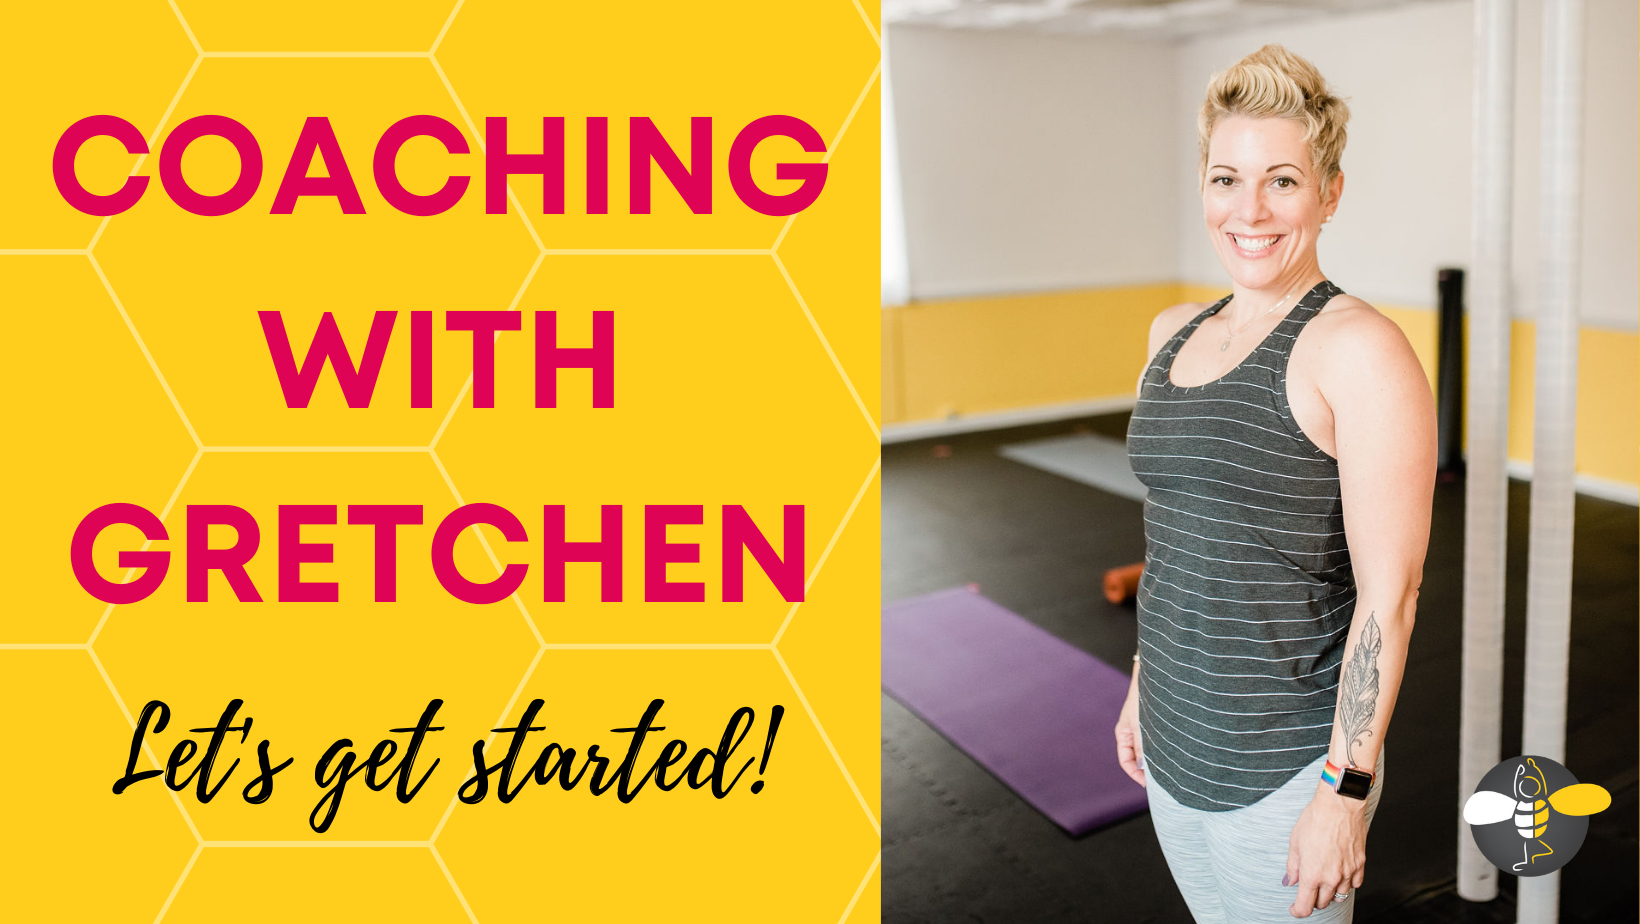 Coaching with Gretchen